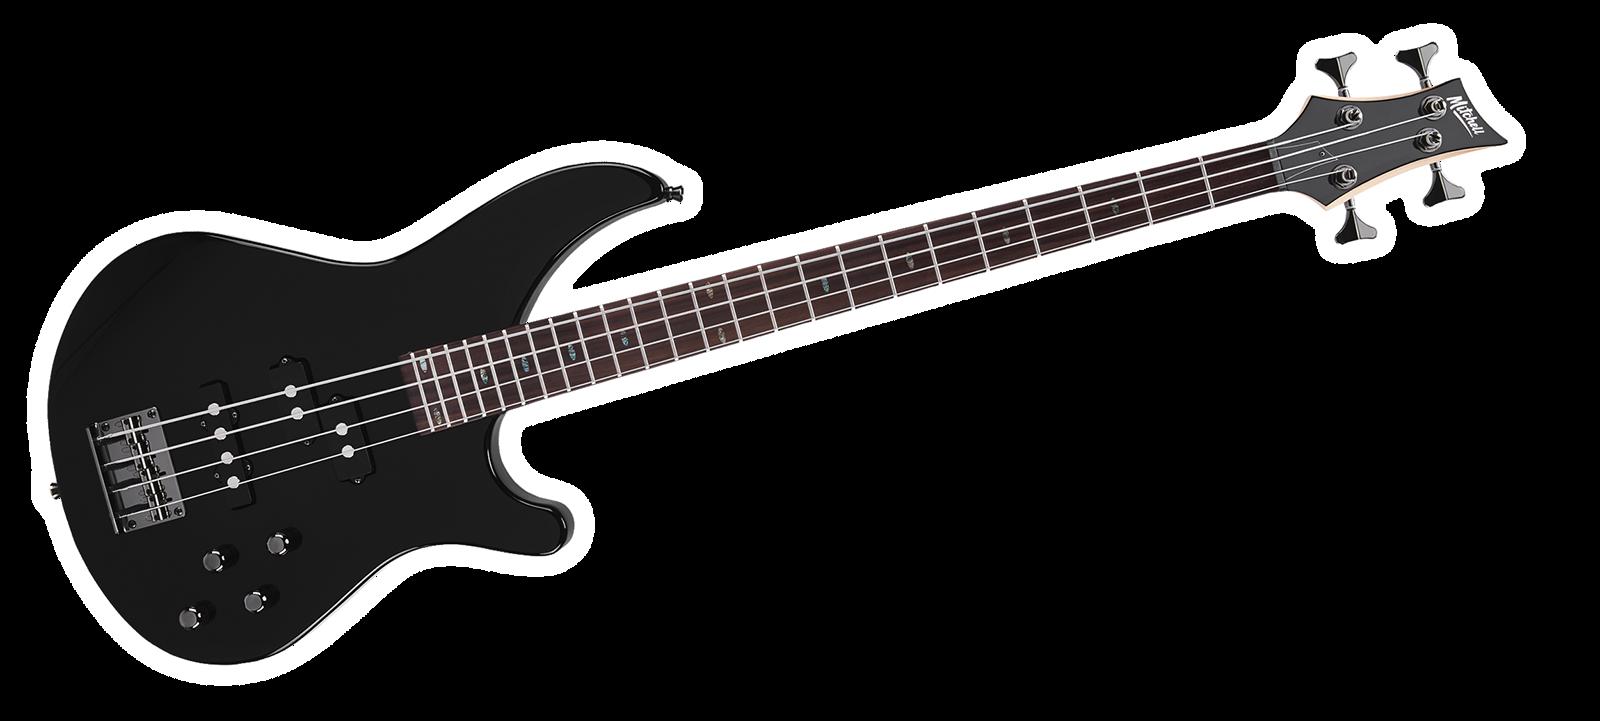 MB200BK Mitchell Electric Bass Guitar Black